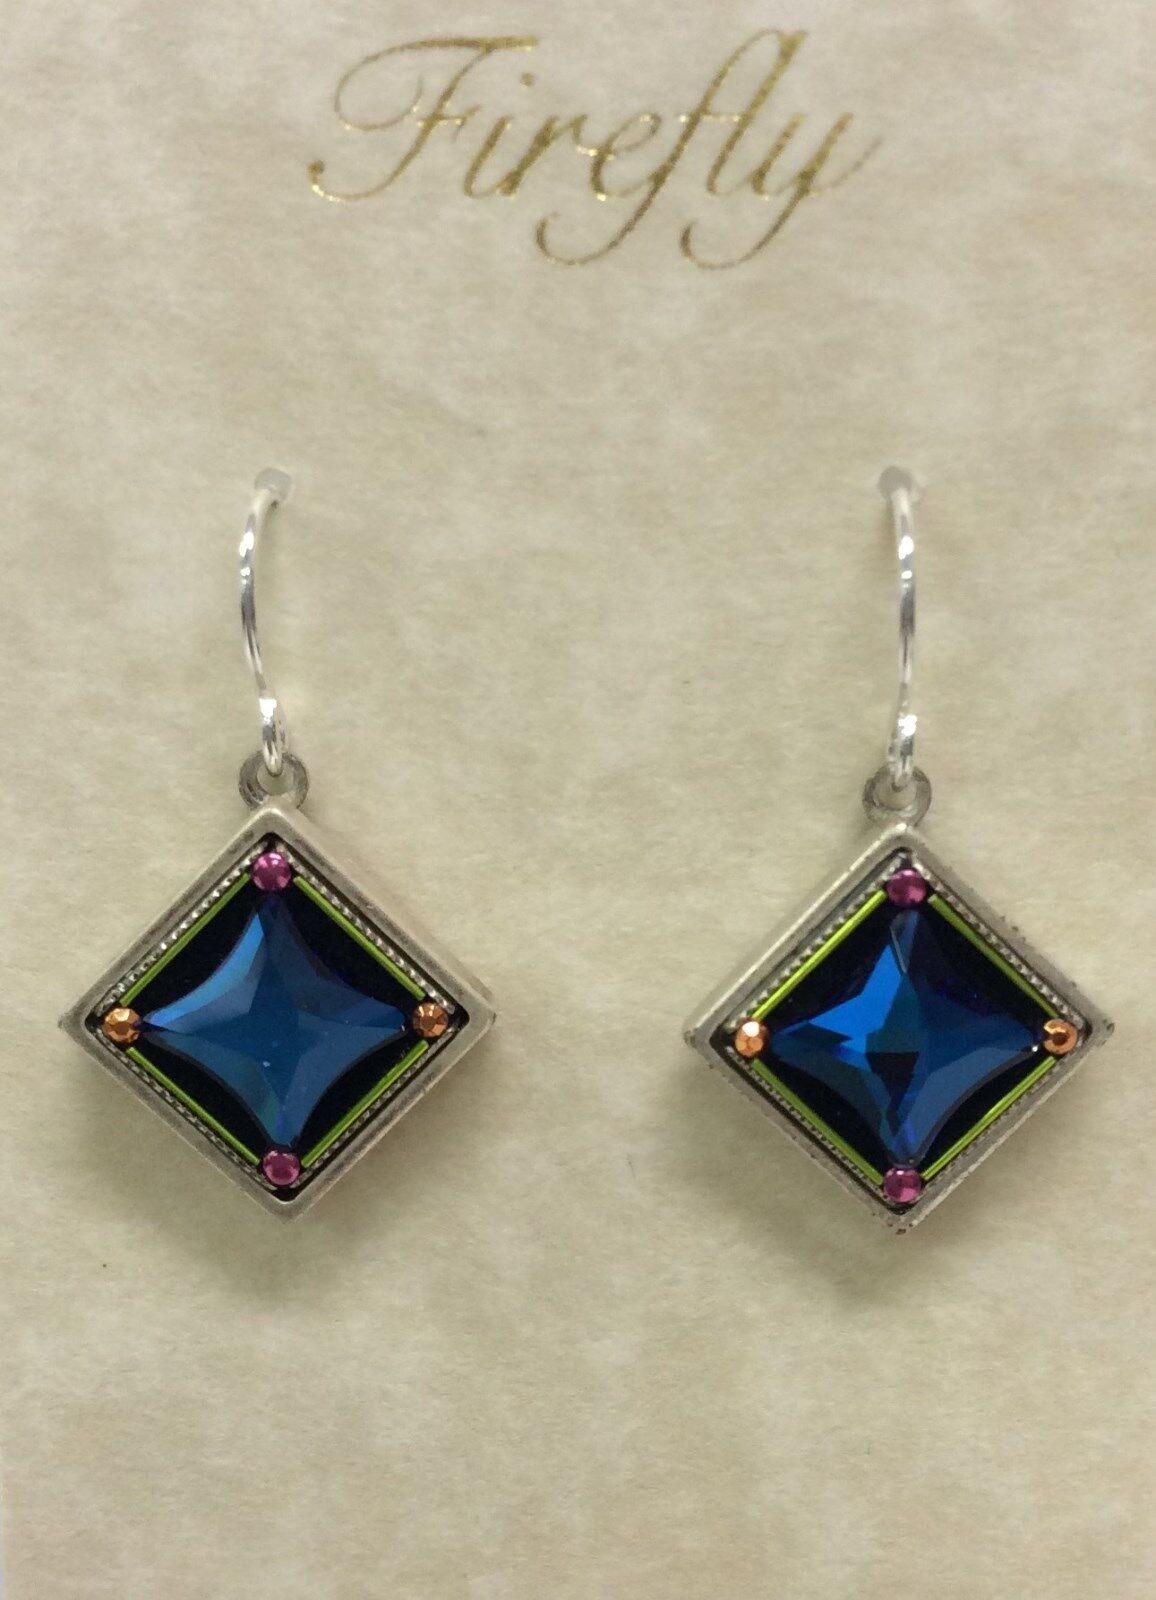 Firefly Fair Trade Jewelry bluee Crystal Geometric Diamond Earrings 7472-MC